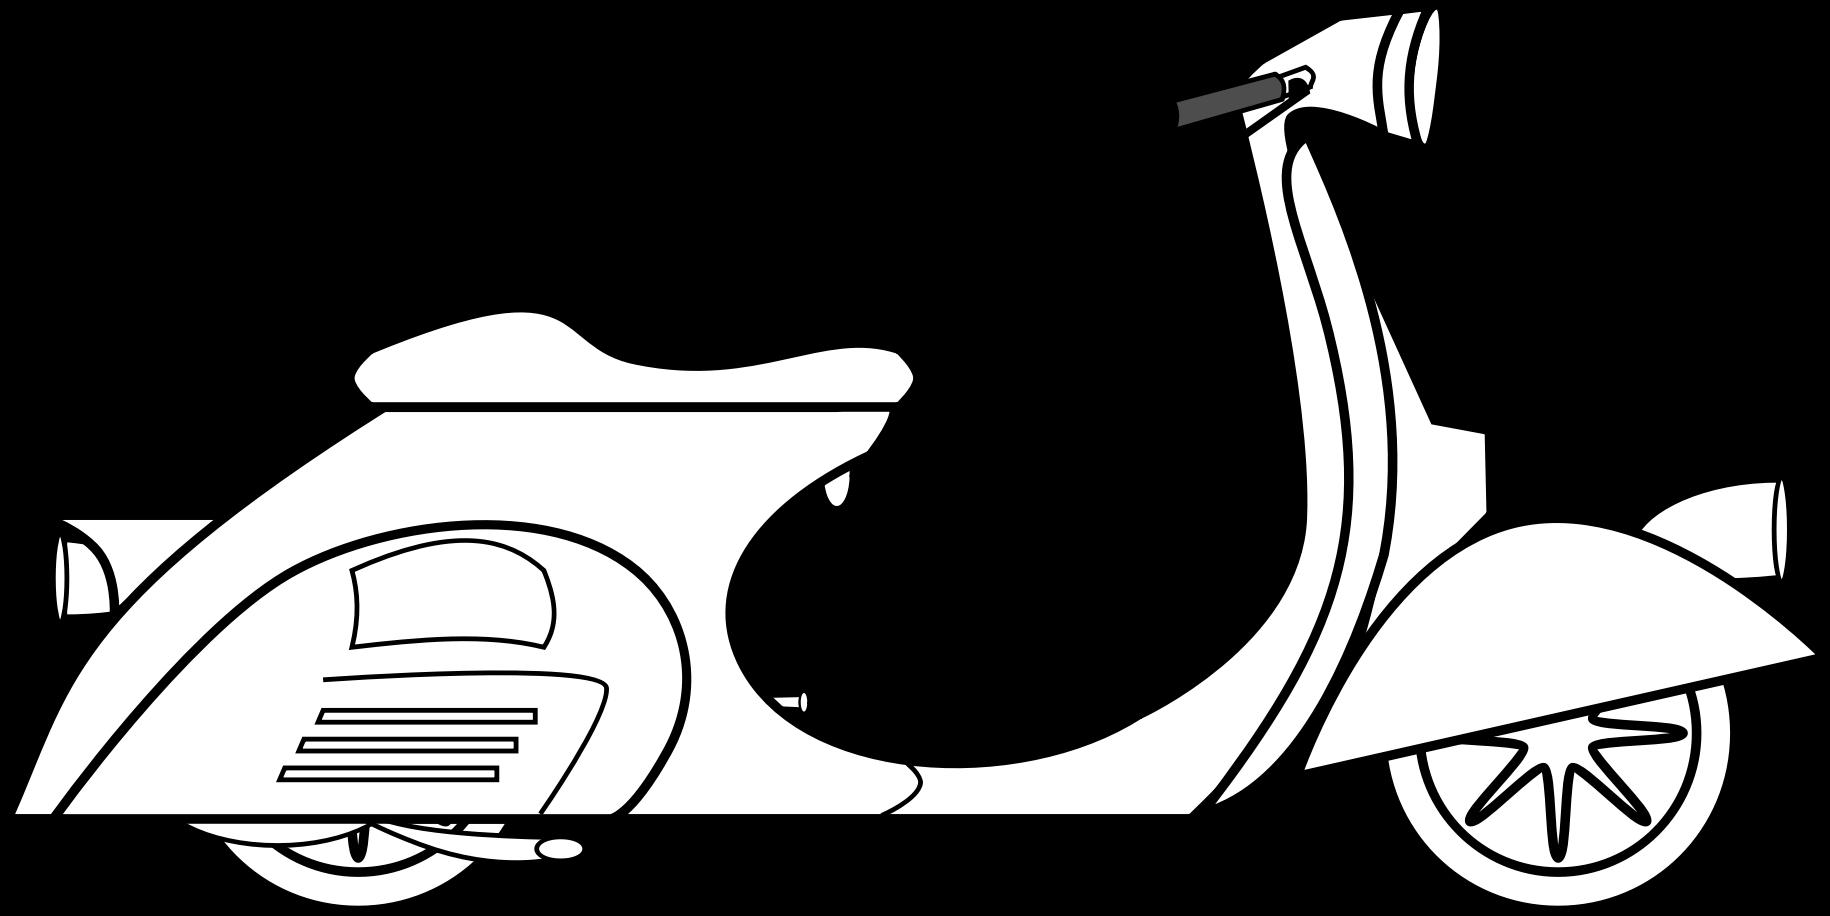 vector transparent stock Vespa big image png. Scooter clipart motor vehicle